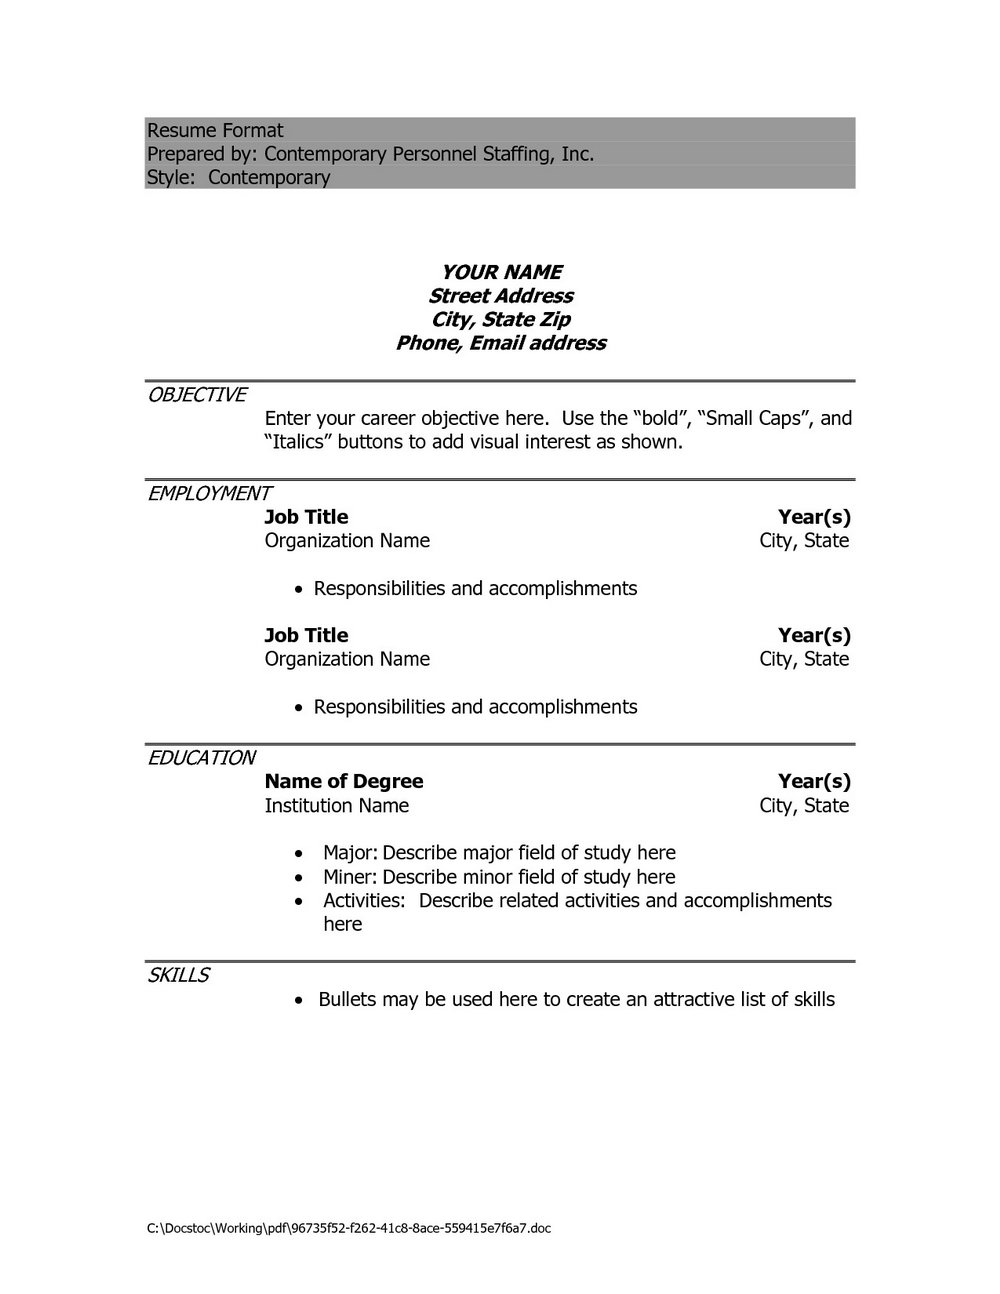 Resume Format Download Pdf Editor